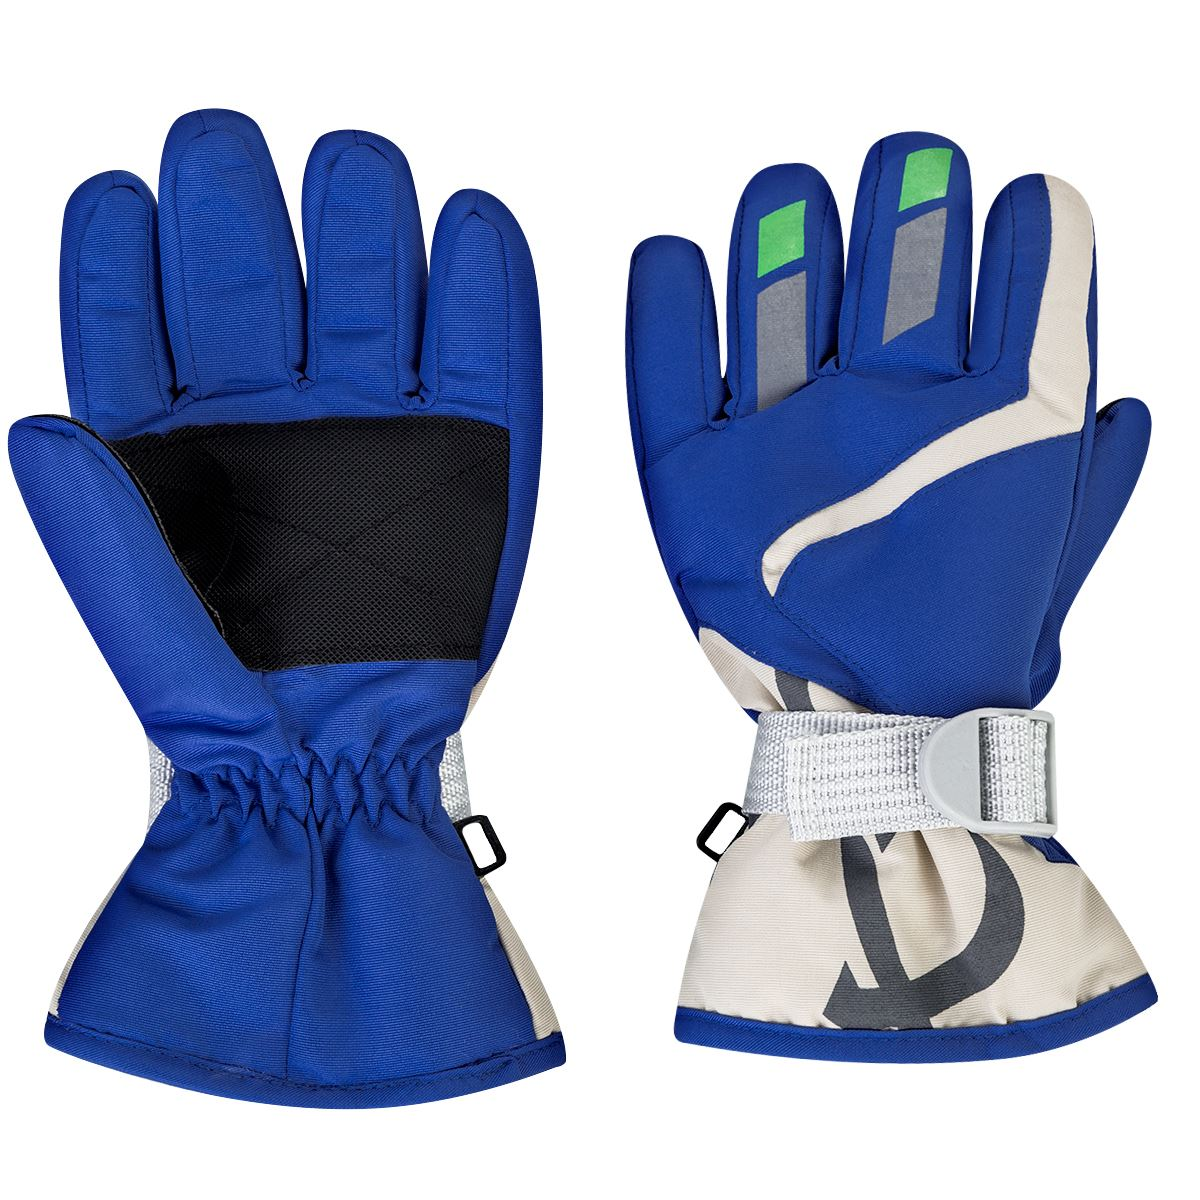 Children Boys/Girls Snowmobile Winter Warm Ski Gloves Sports Waterproof Windproof Snow Mitten Adjustable Strap Skiing